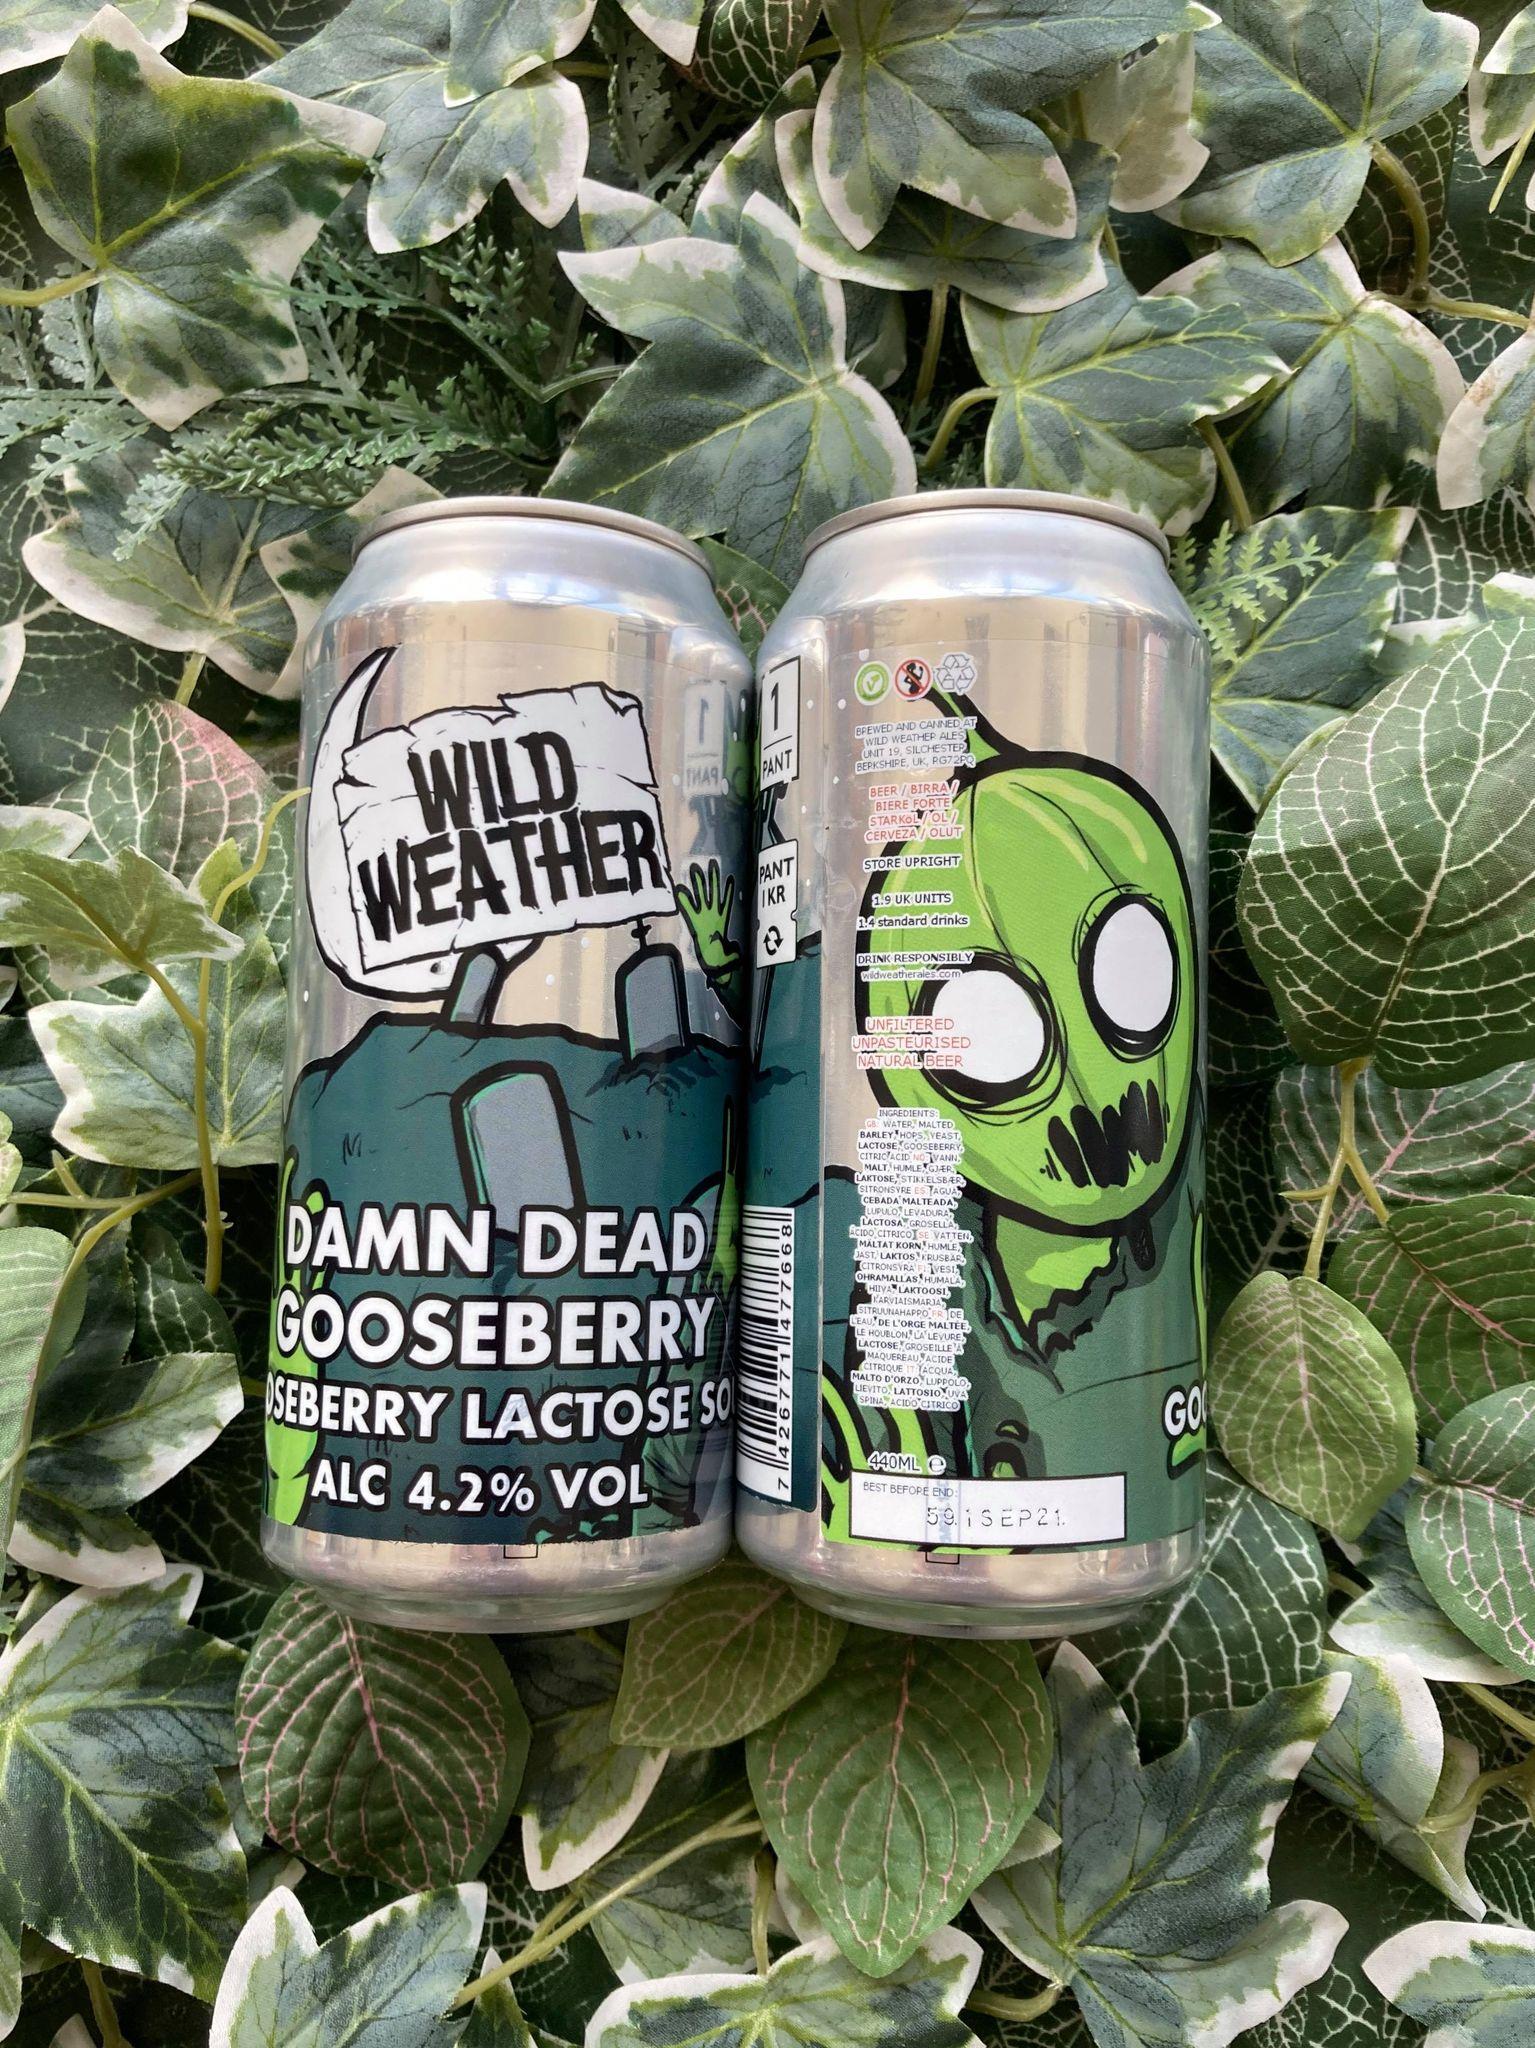 Wild Weather - Damn Dead Gooseberry 4.2%